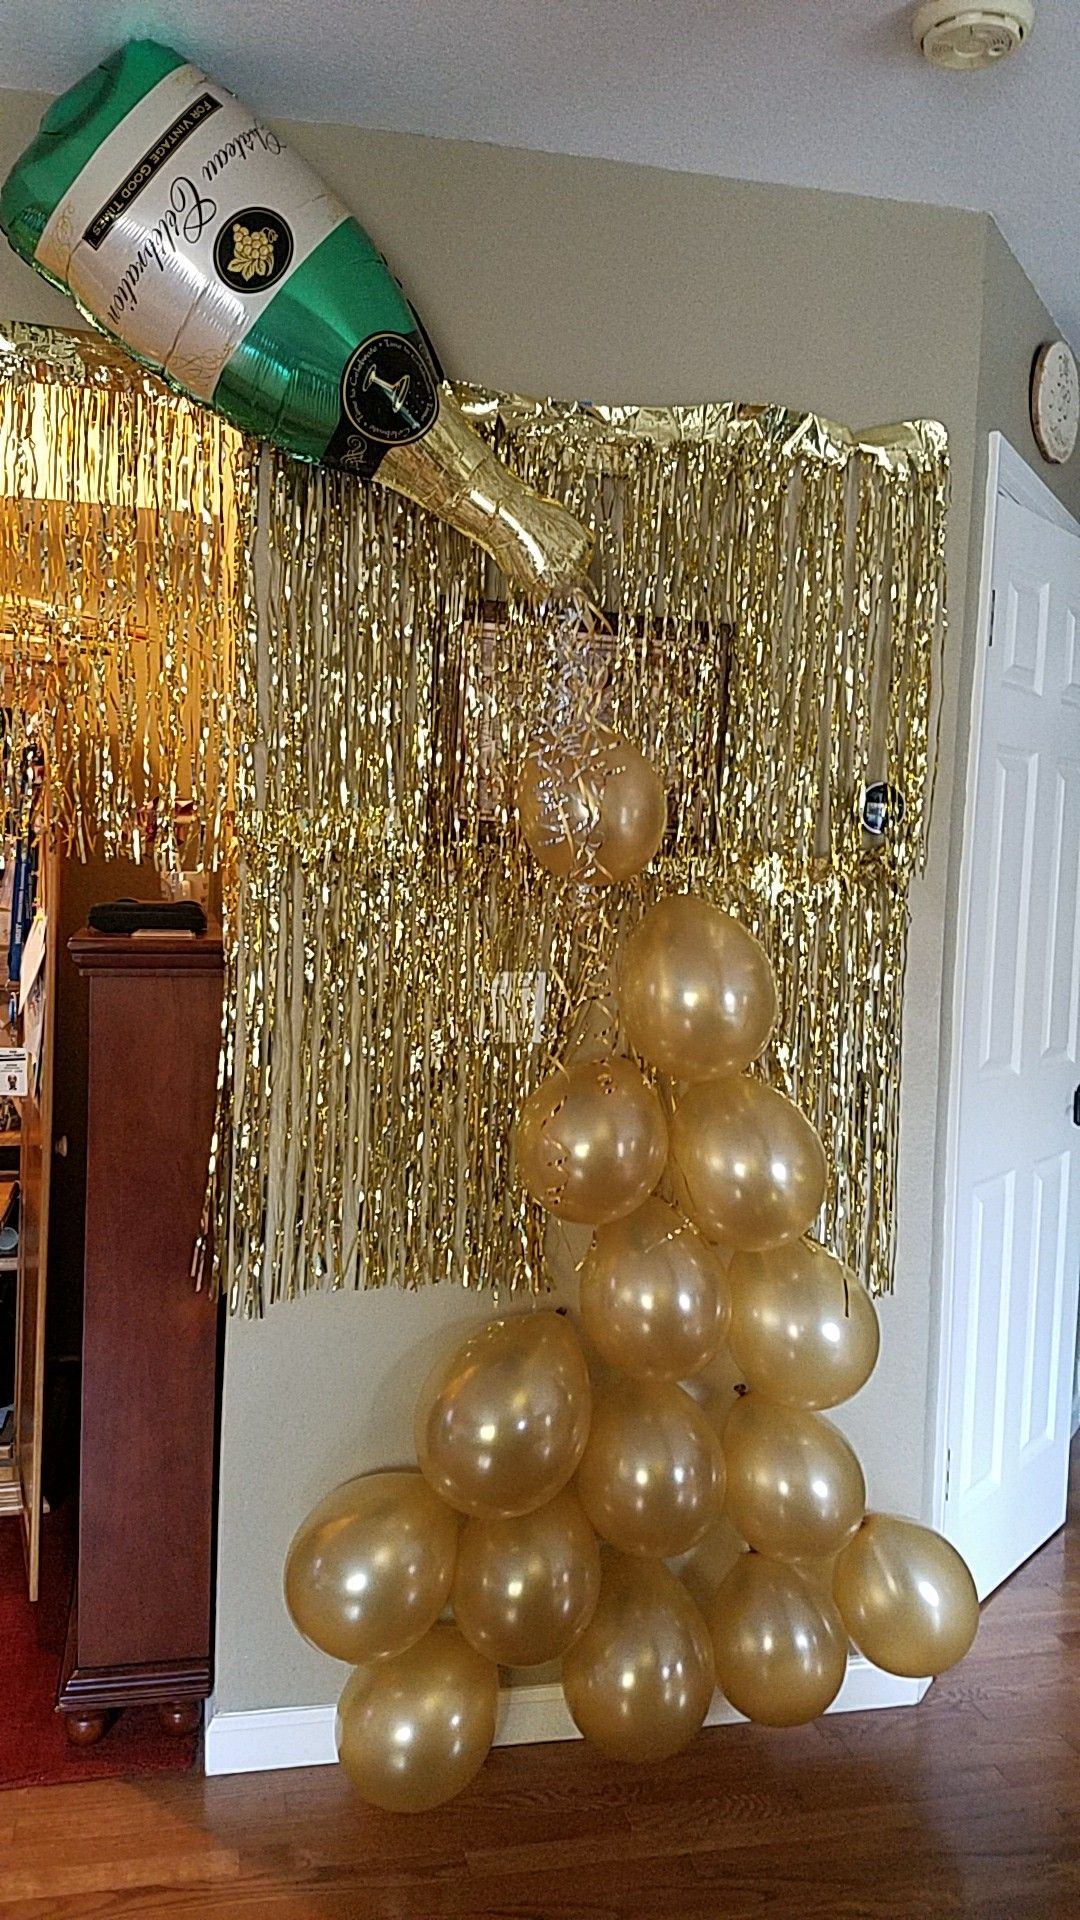 Popping Bottles!!! Champagne Balloon Bottle display!